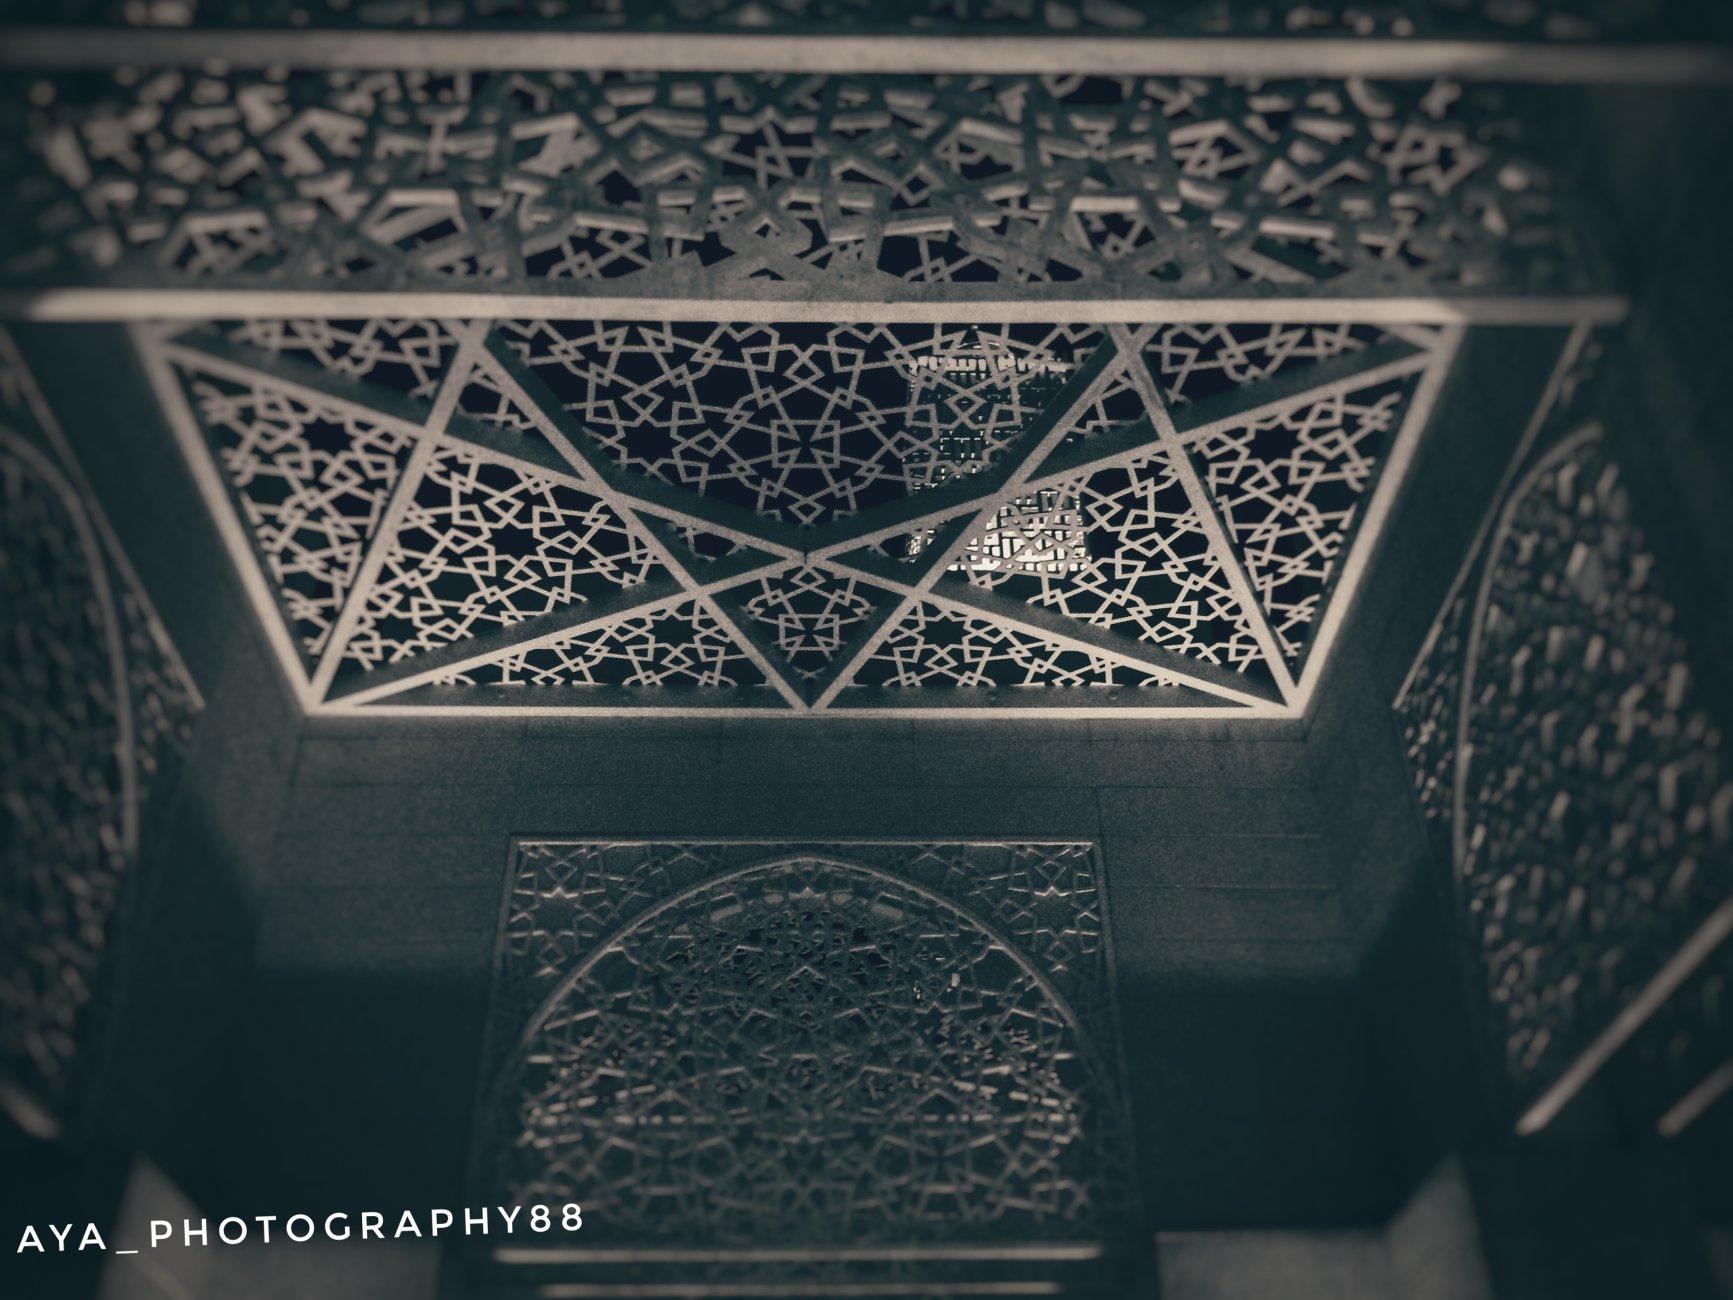 This Amna Bint Ahmed Alghuir mosque at alsafiya park in ajman